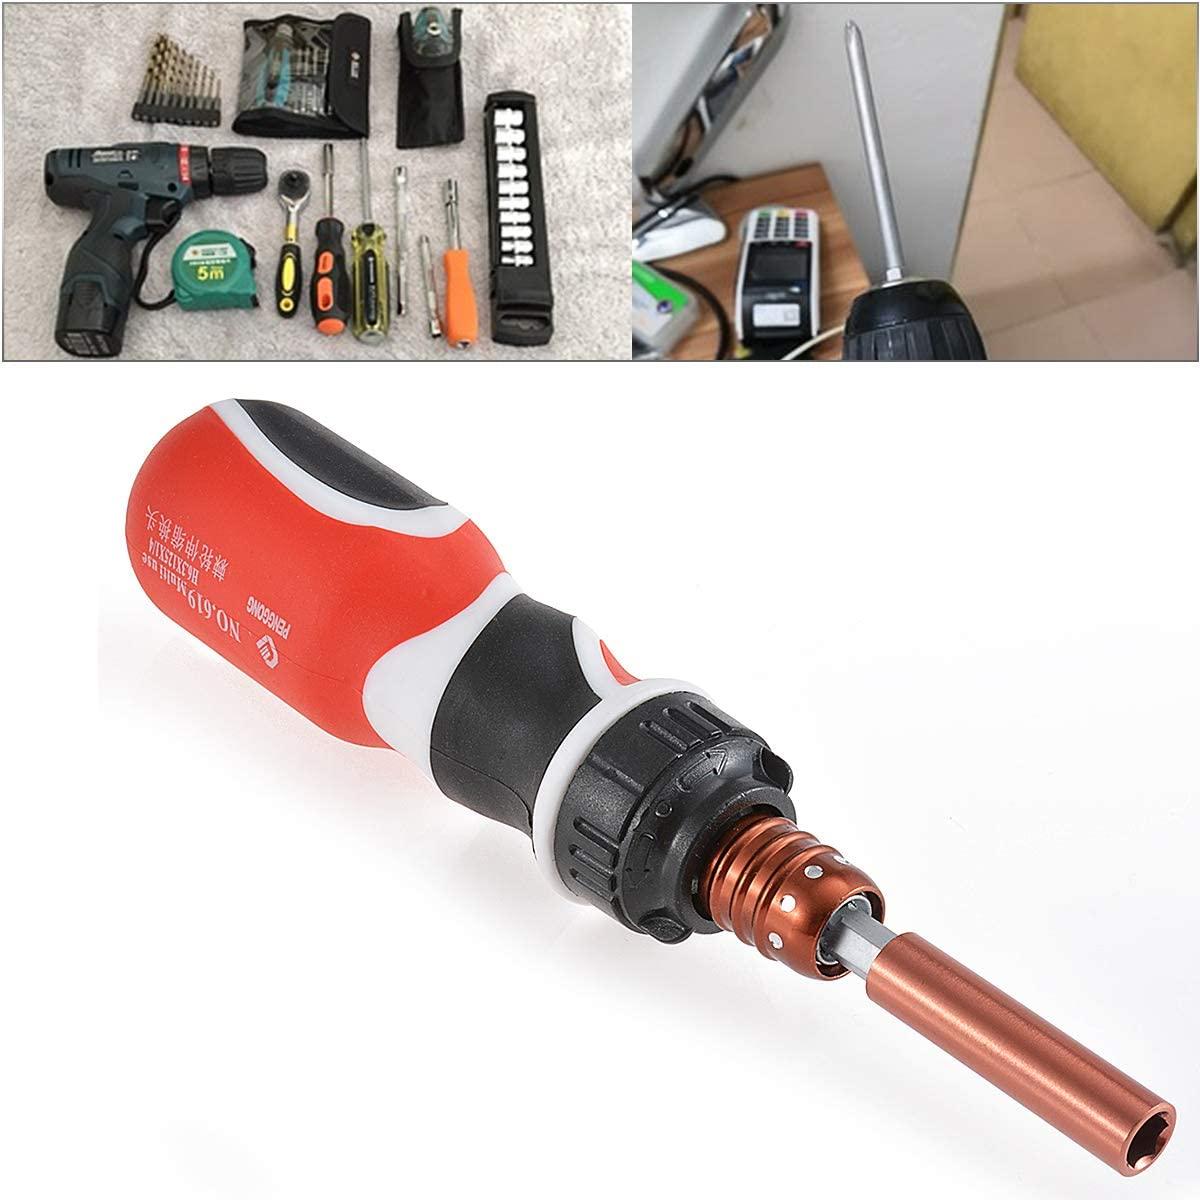 HOHXEN Ratchet Screwdriver Bit Telescopic Dual Purpose Adjustable For 1.41-3.7 Inch Magnetic Screwdrivers Precision Repairing Tool for Homework, DIY